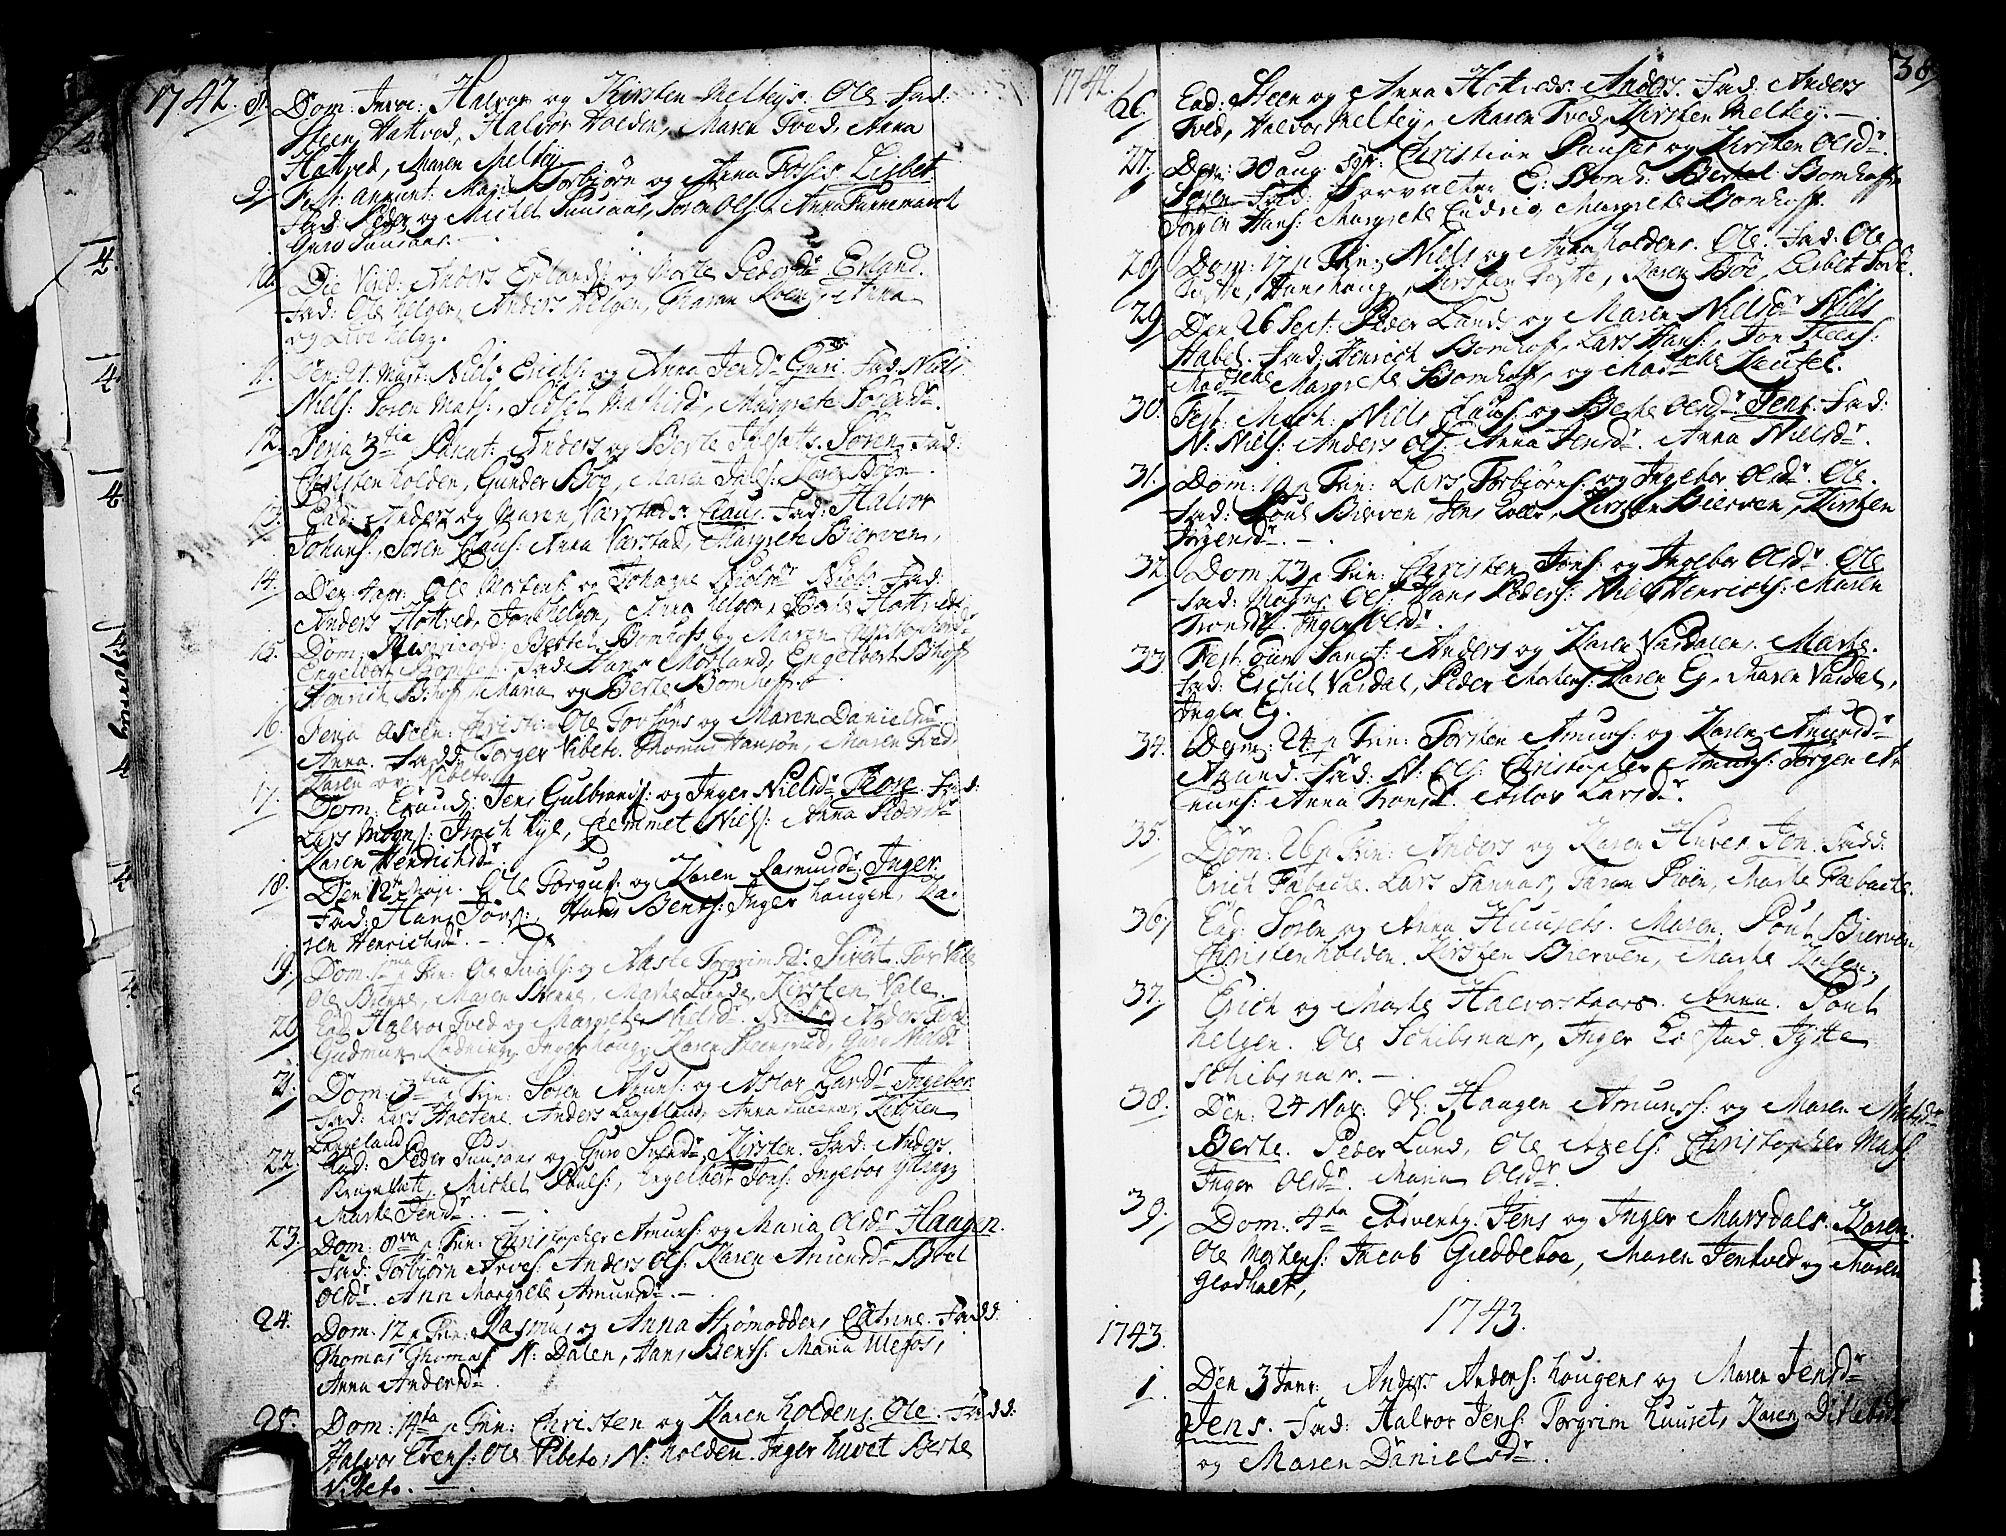 SAKO, Holla kirkebøker, F/Fa/L0001: Ministerialbok nr. 1, 1717-1779, s. 38